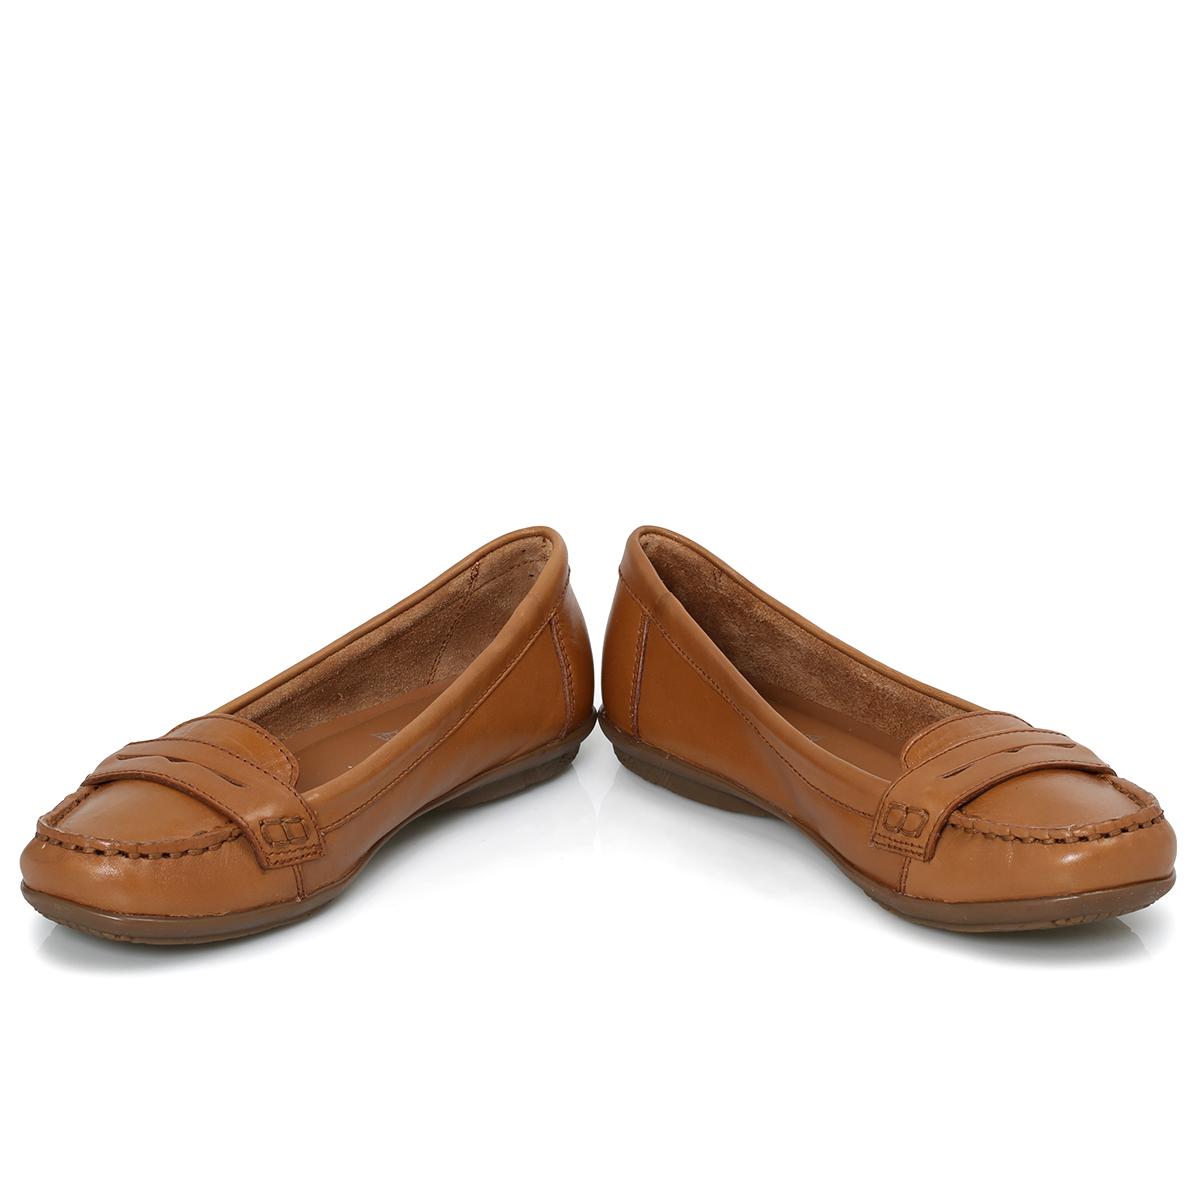 Women's Off White Multi Hush Puppies Zen Mary Jane Shoes